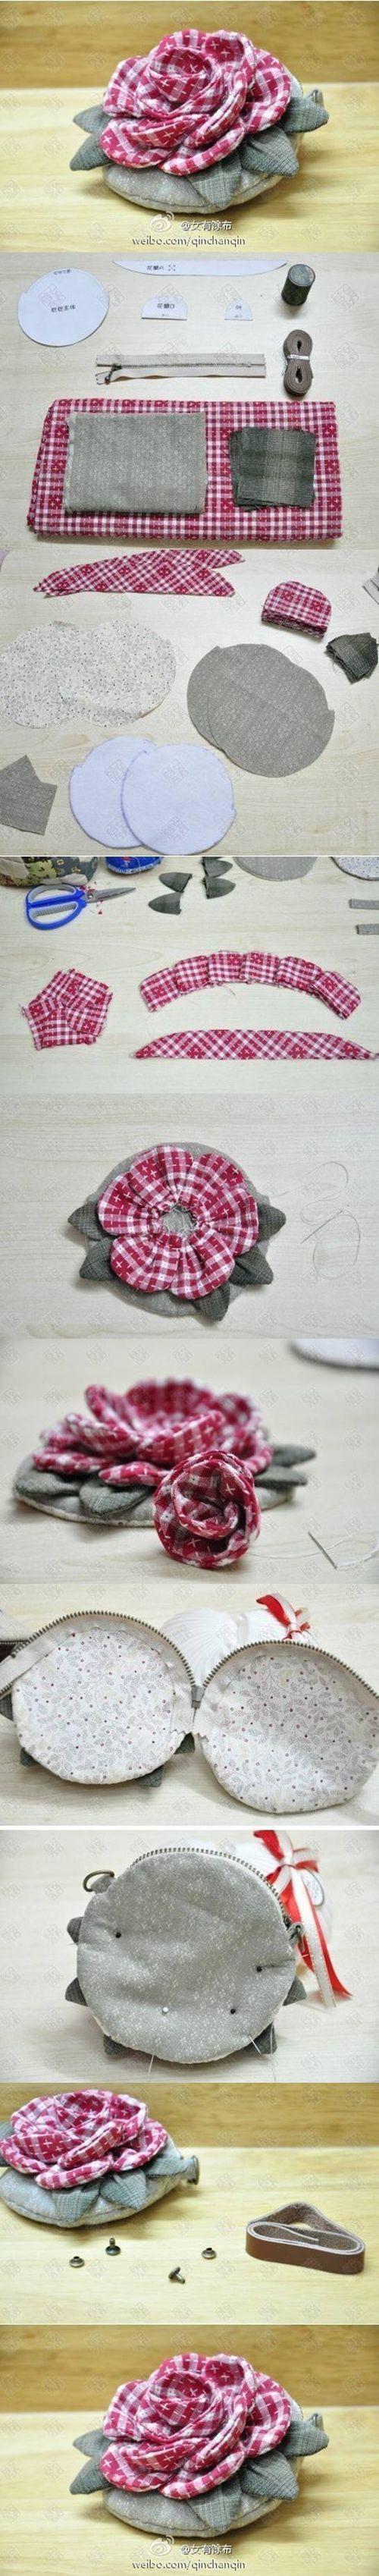 DIY Purse with Flower DIY Projects / UsefulDIY.com